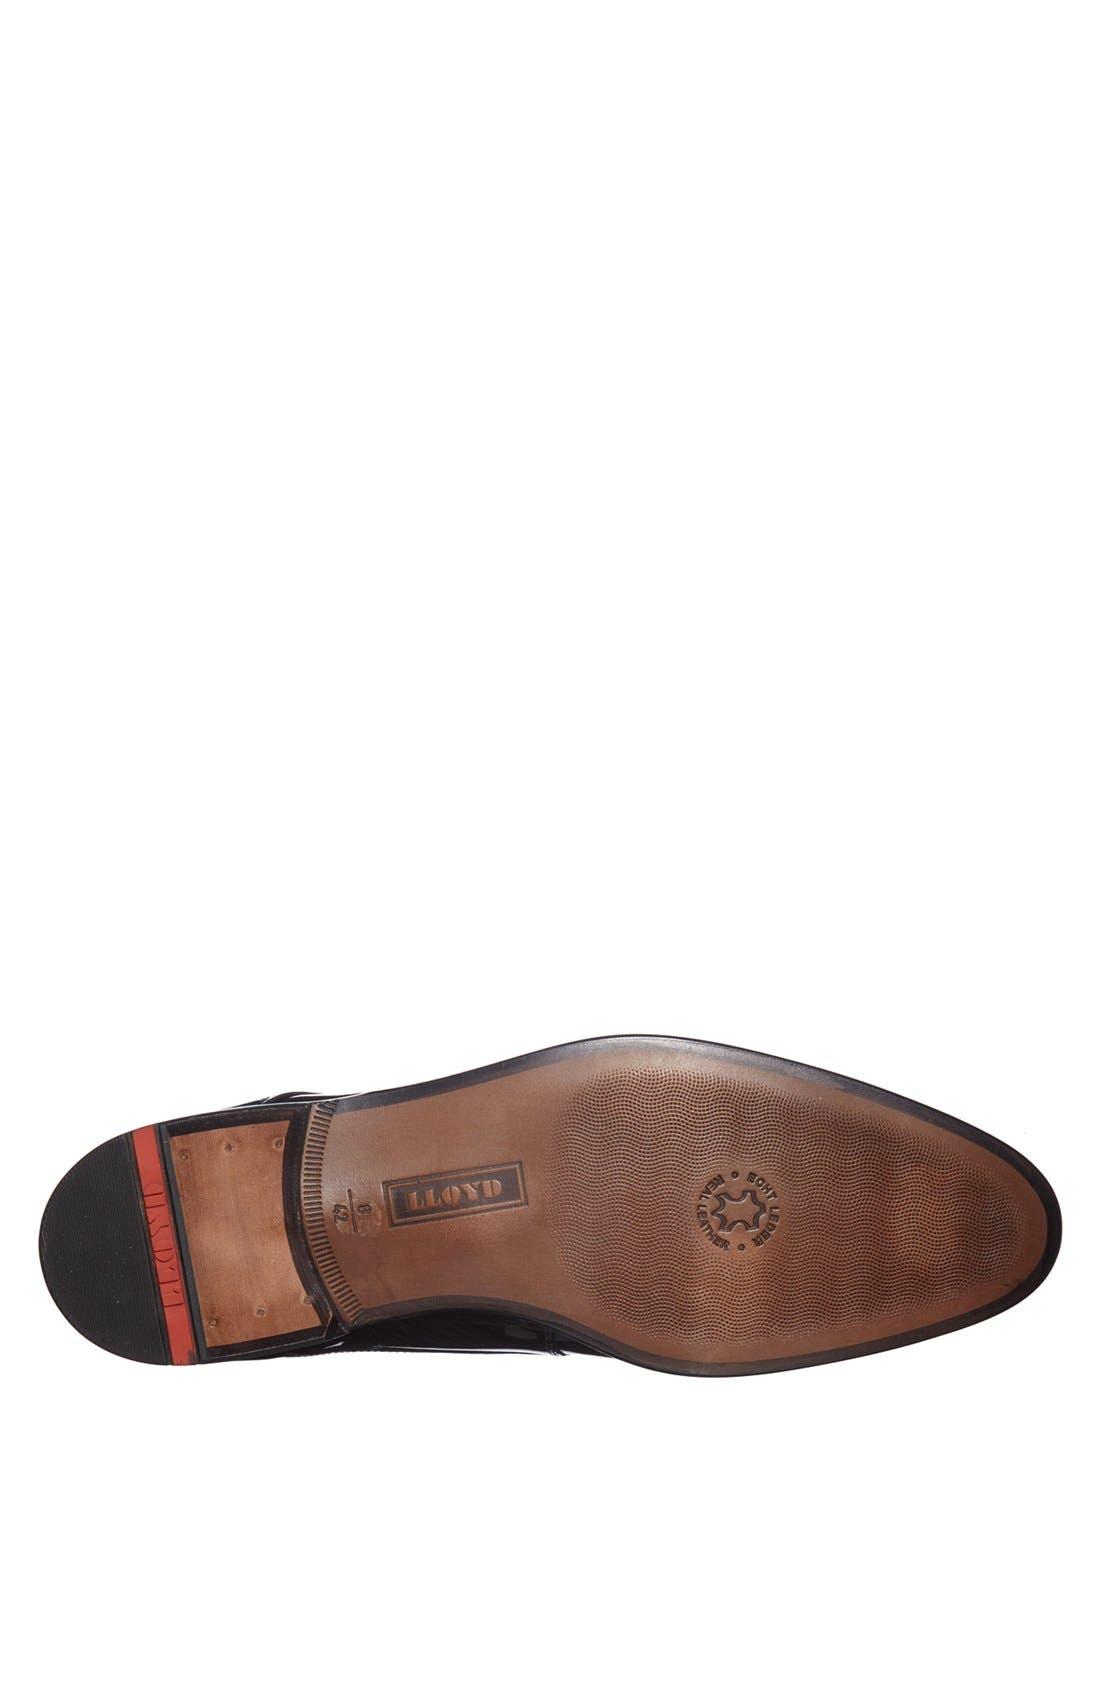 'Jerez' Plain Toe Derby,                             Alternate thumbnail 4, color,                             Black Patent